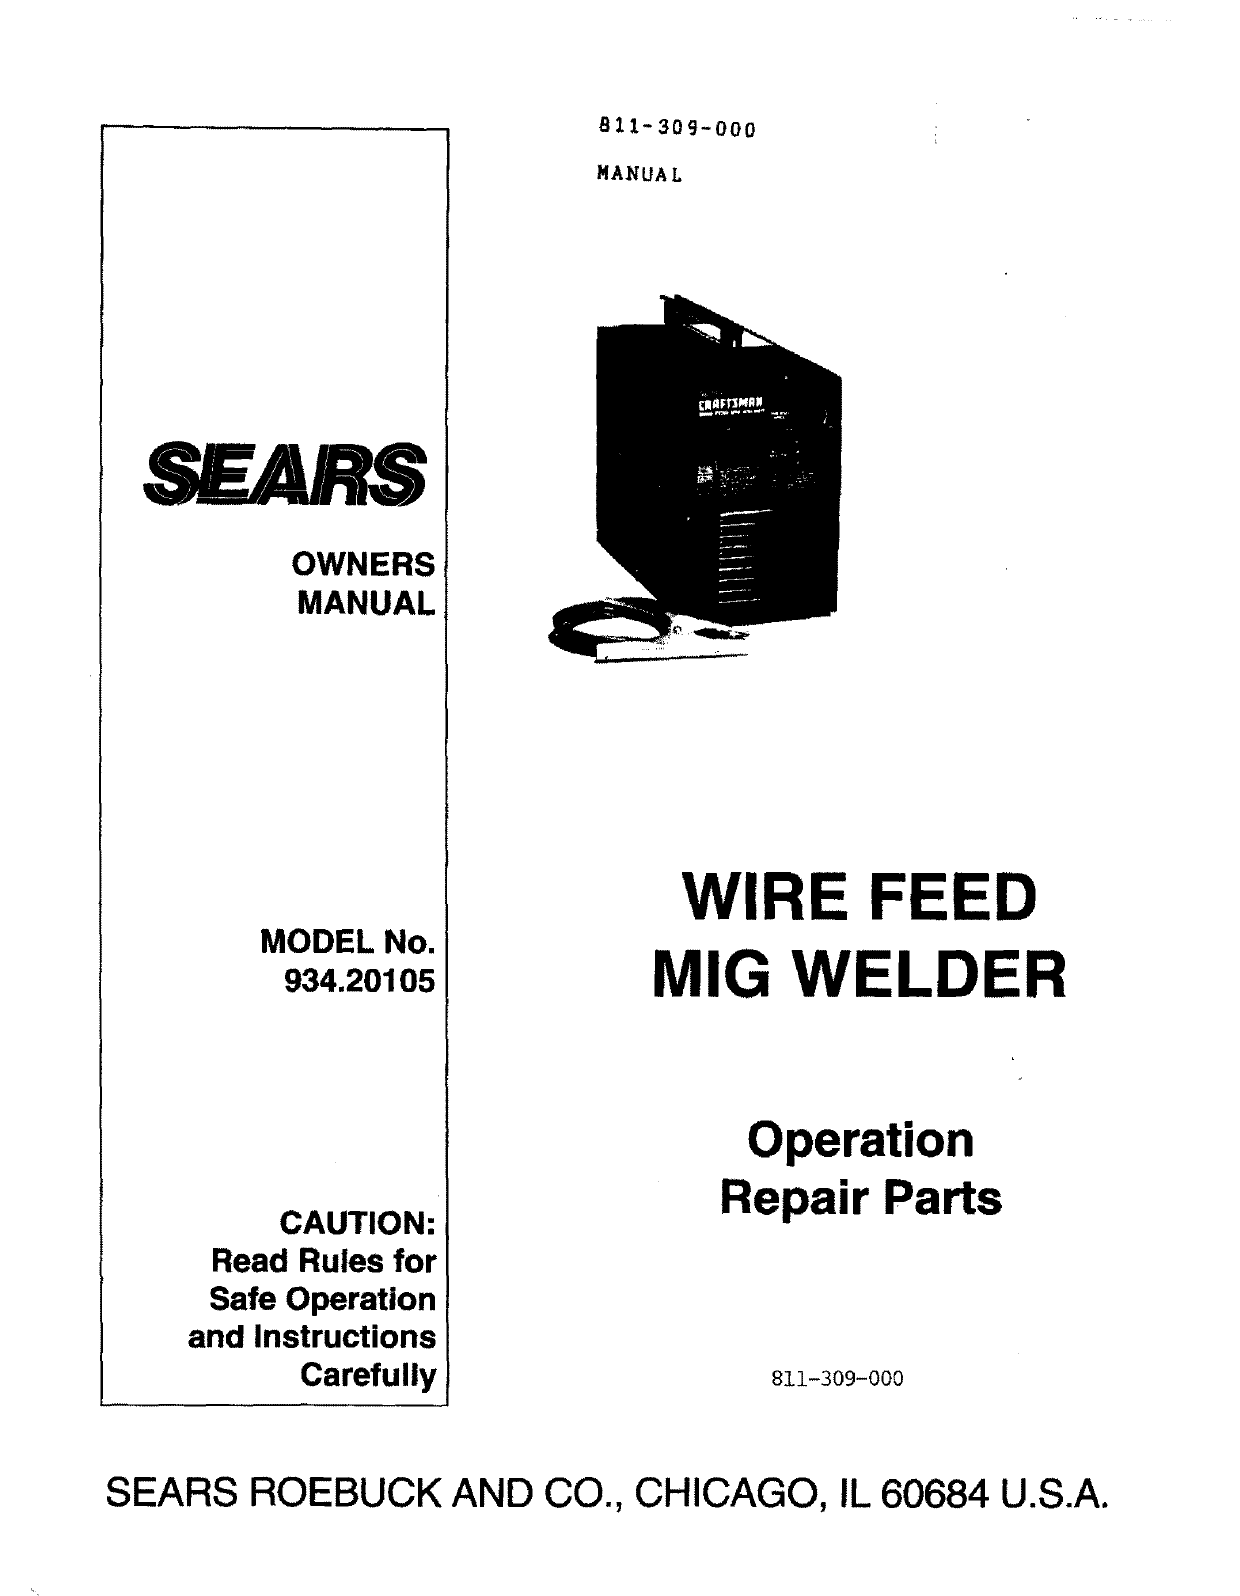 Craftsman 93420105 User Manual WELDER Manuals And Guides L0803454